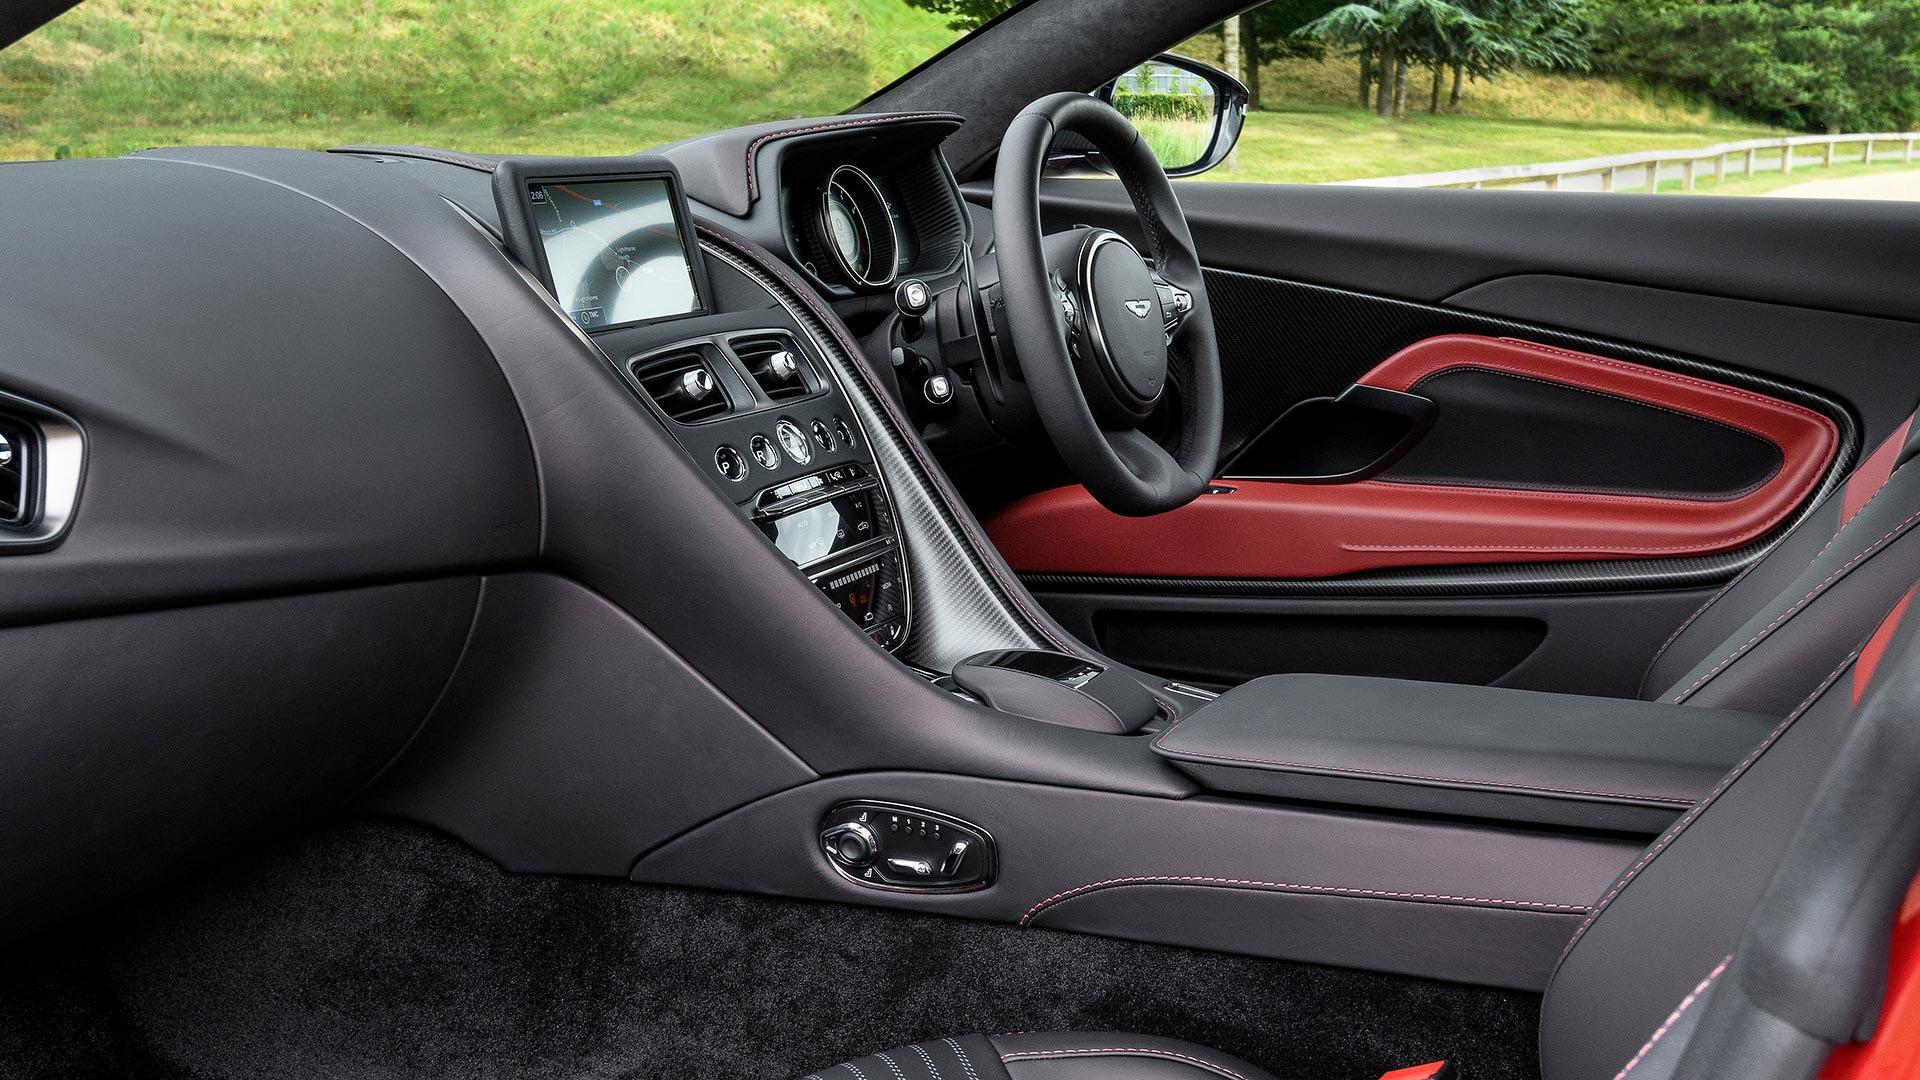 Aston Martin Builds One Off Crimson Db11 For Royal Regatta